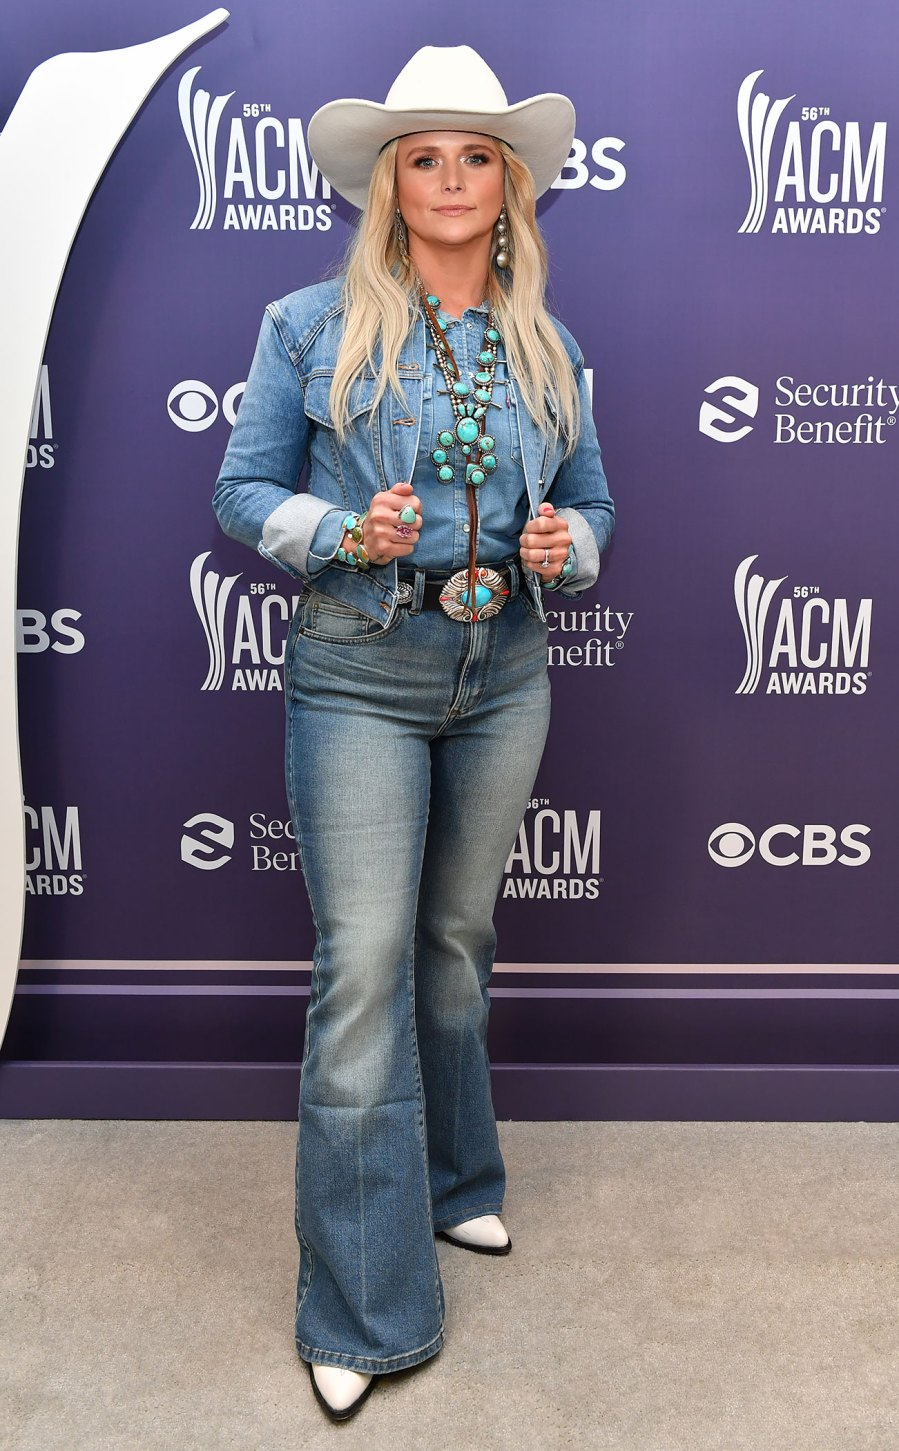 Academy of Country Music Awards Red Carpet Arrivals - Miranda Lambert